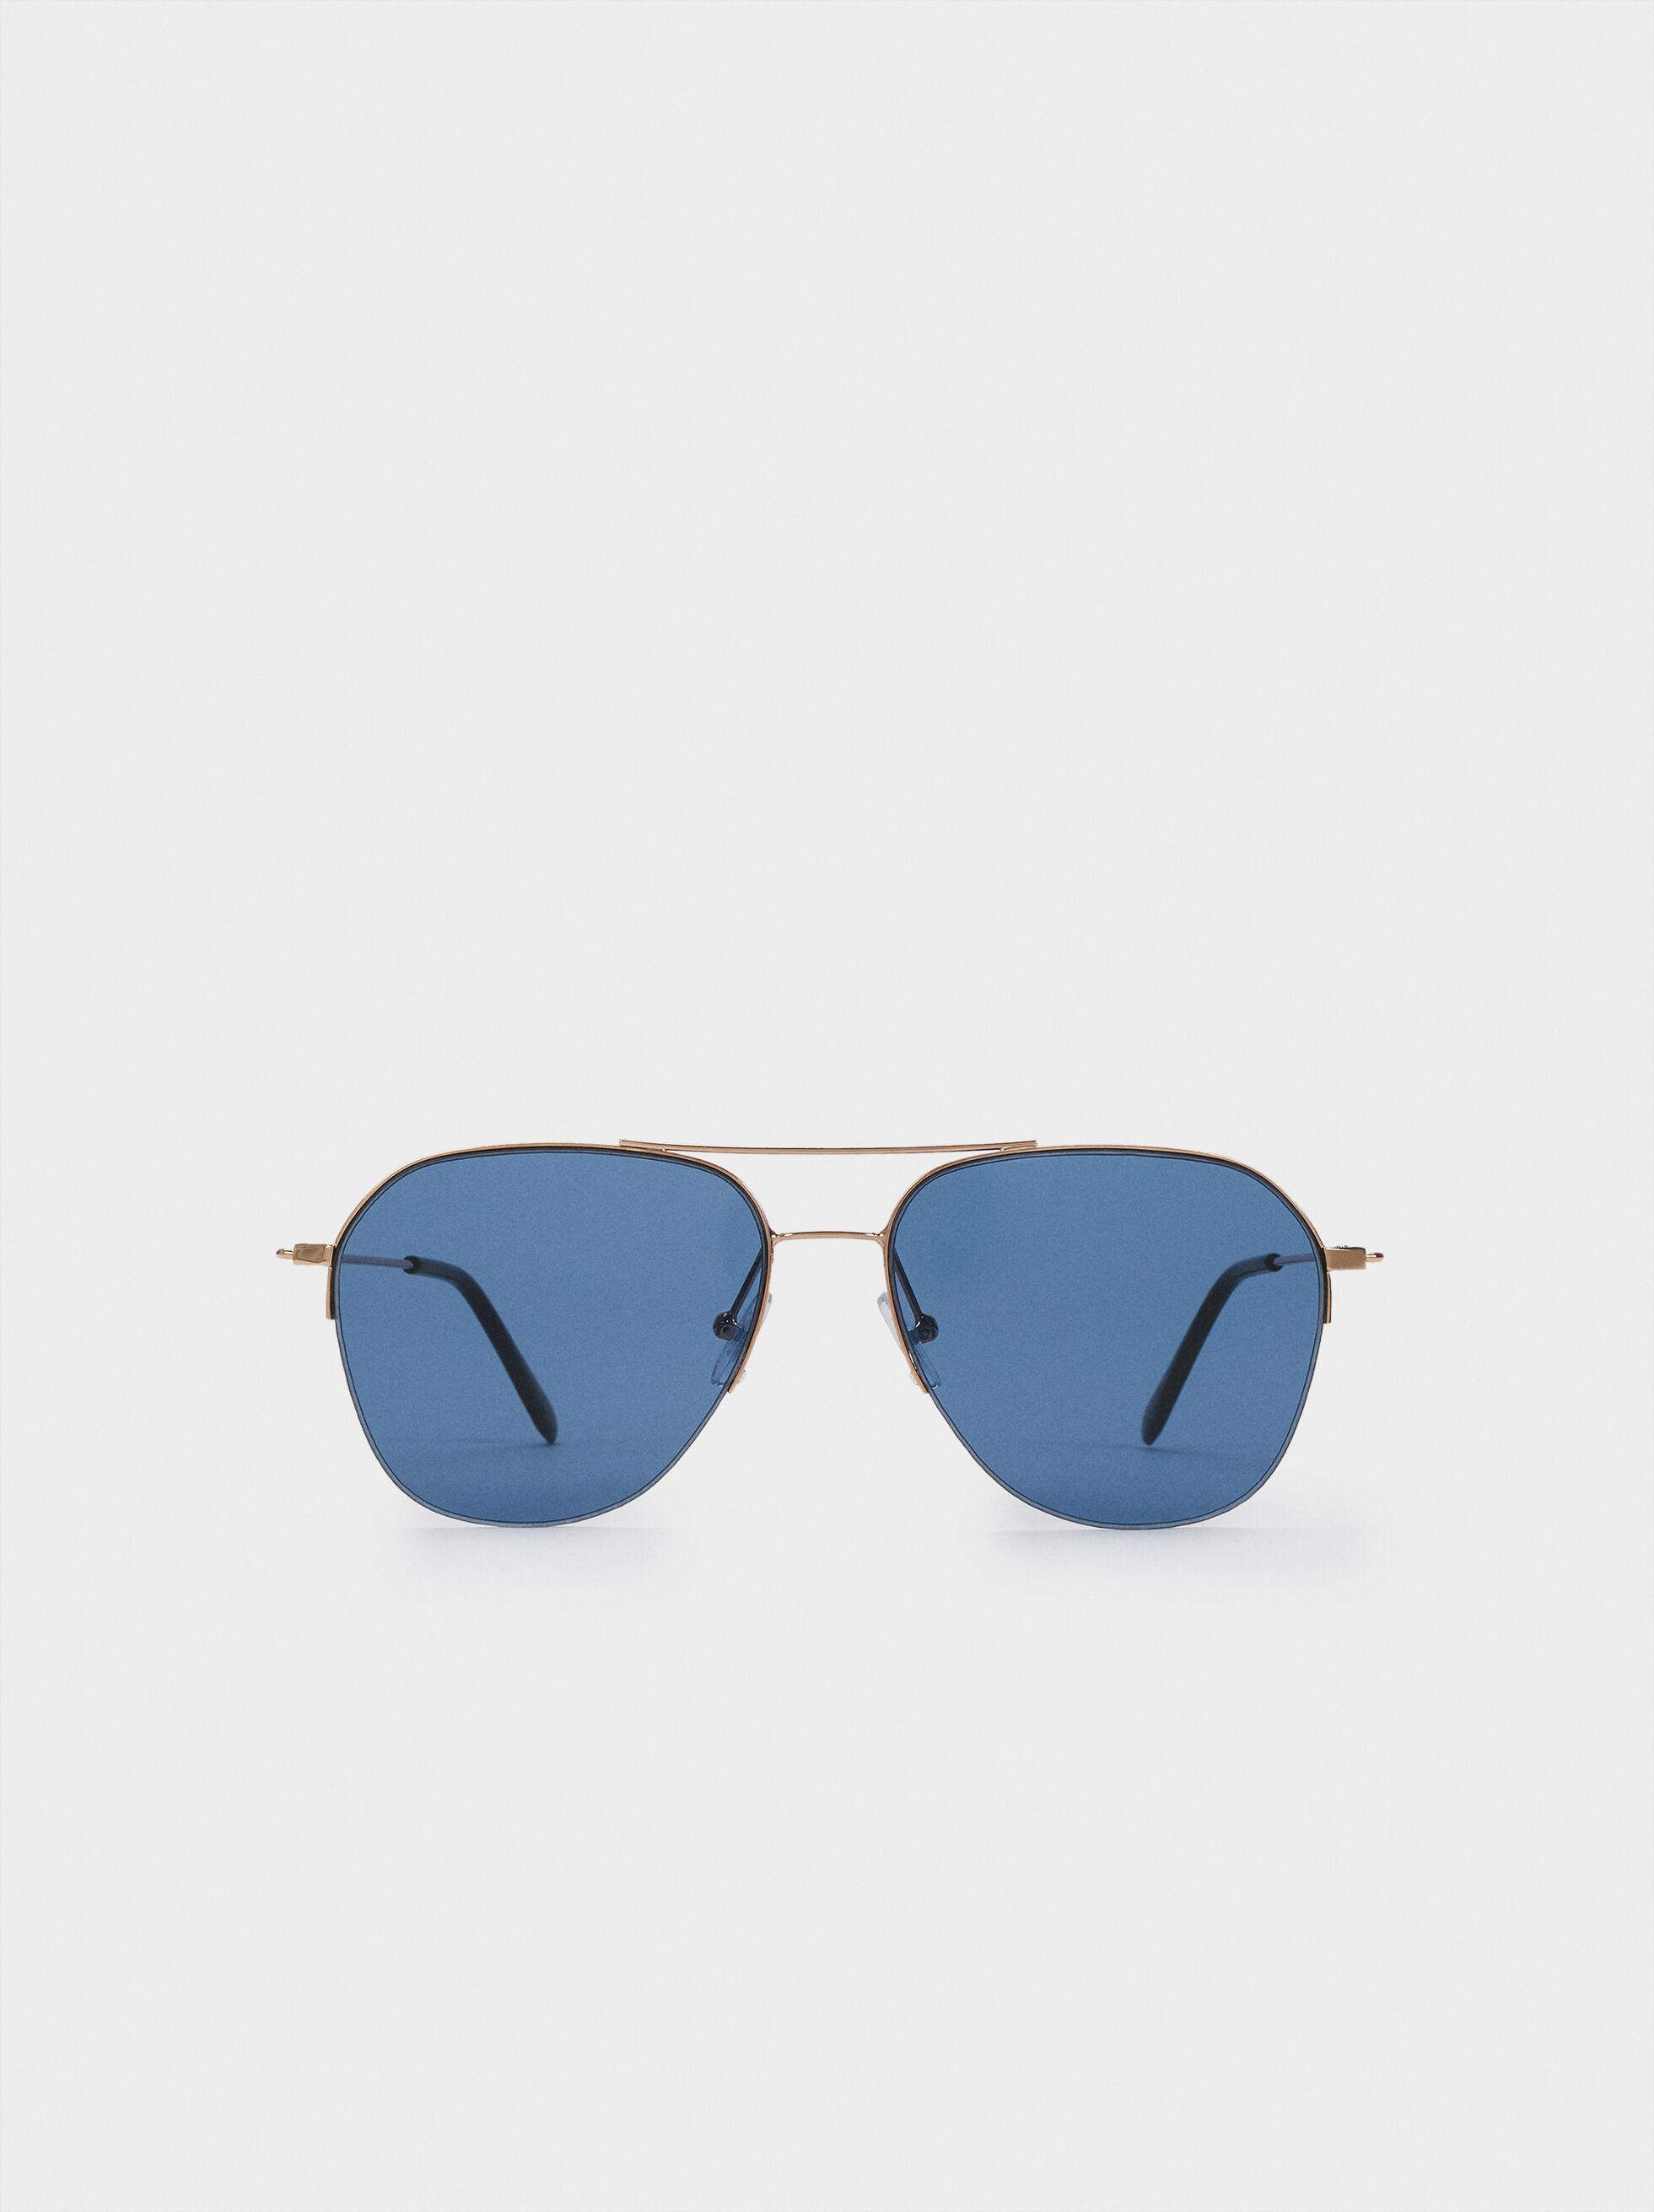 Occhiali Da Sole Stile Aviatore, Arancione, hi-res